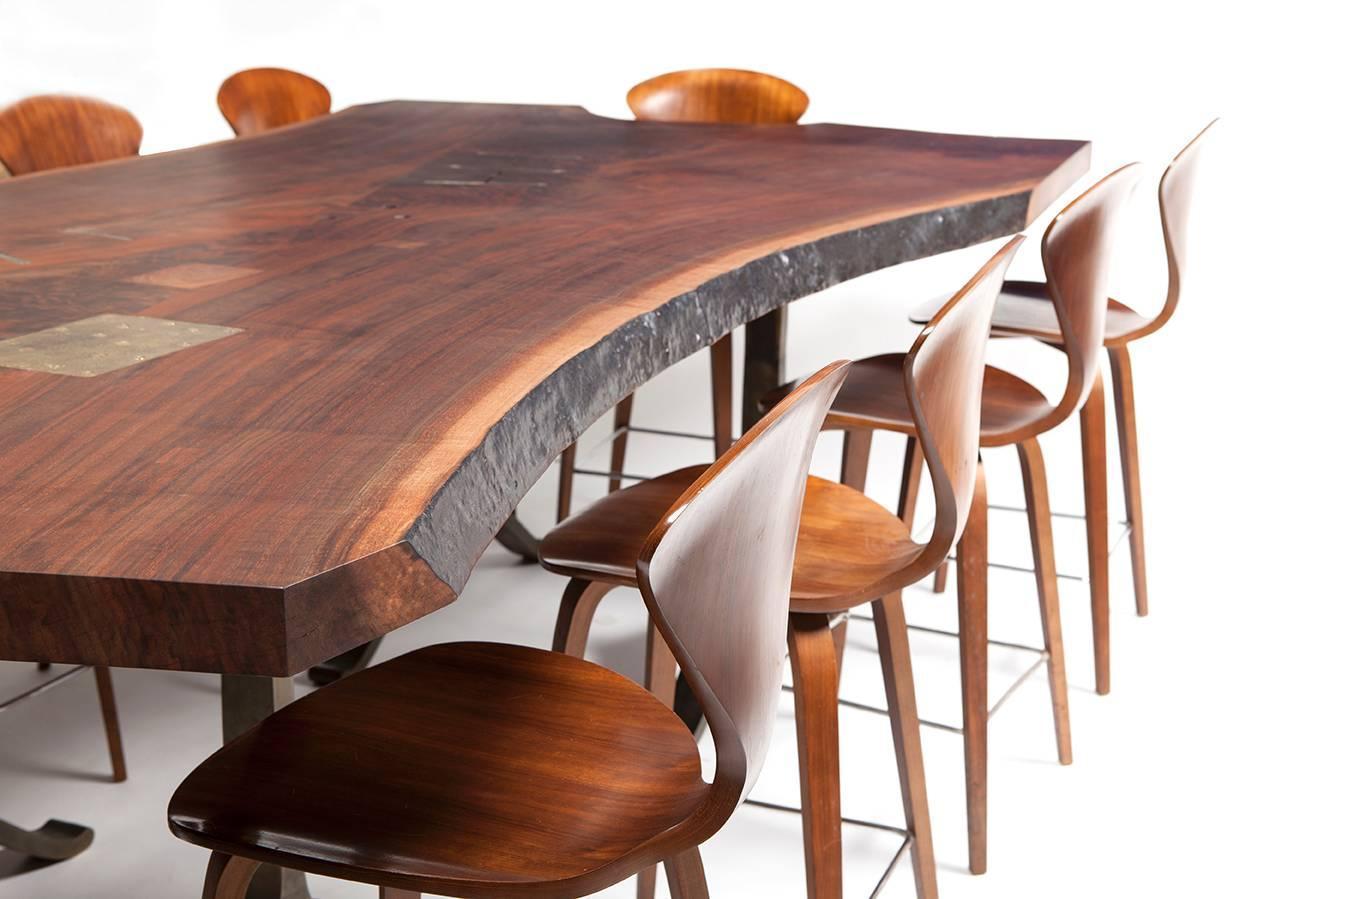 BDDW Walnut Slab Live Edge Dining Table with Cast Bronze  : BDDWCornerz from www.1stdibs.com size 1348 x 899 jpeg 97kB